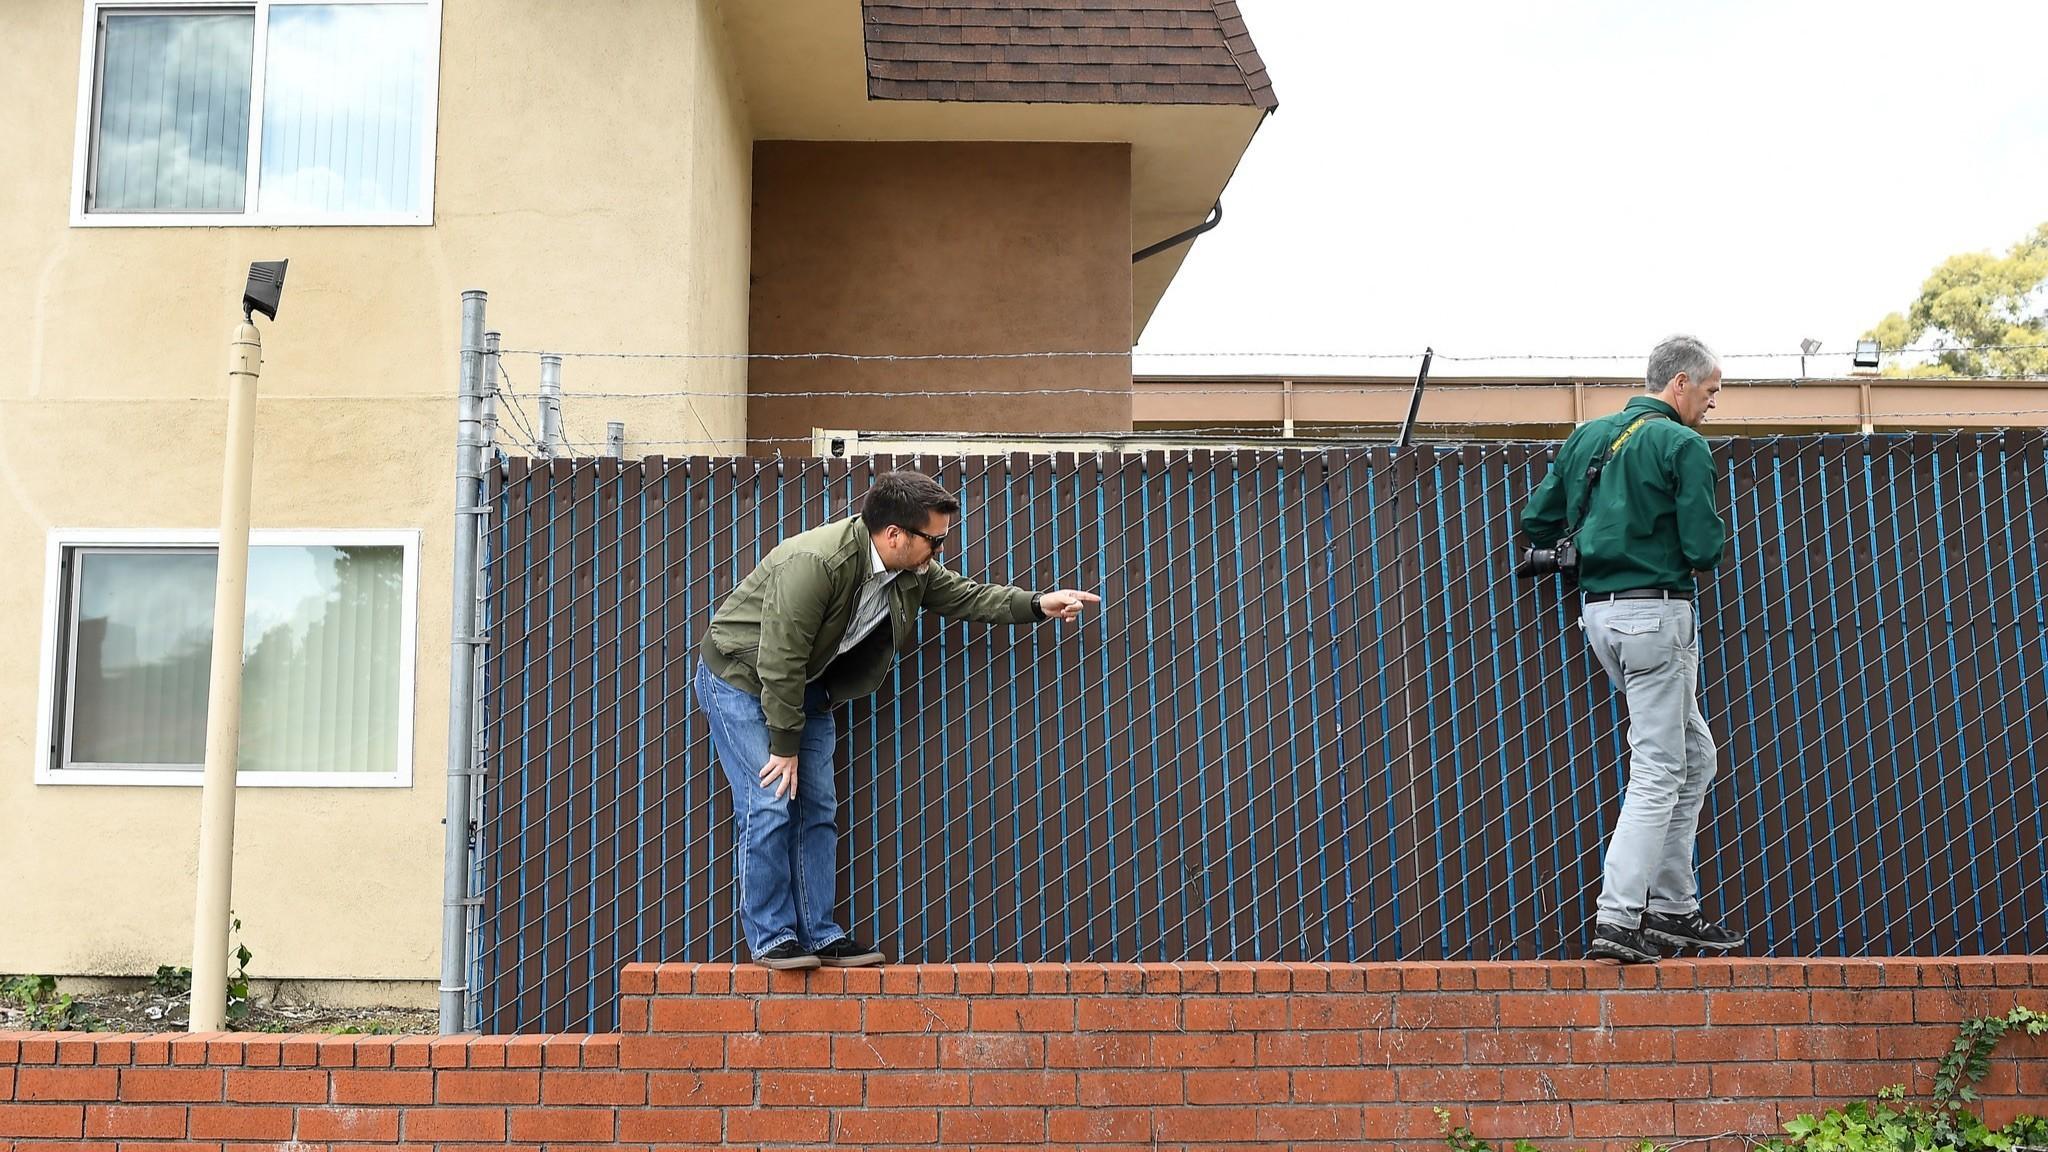 Wall bent by Hayward fault